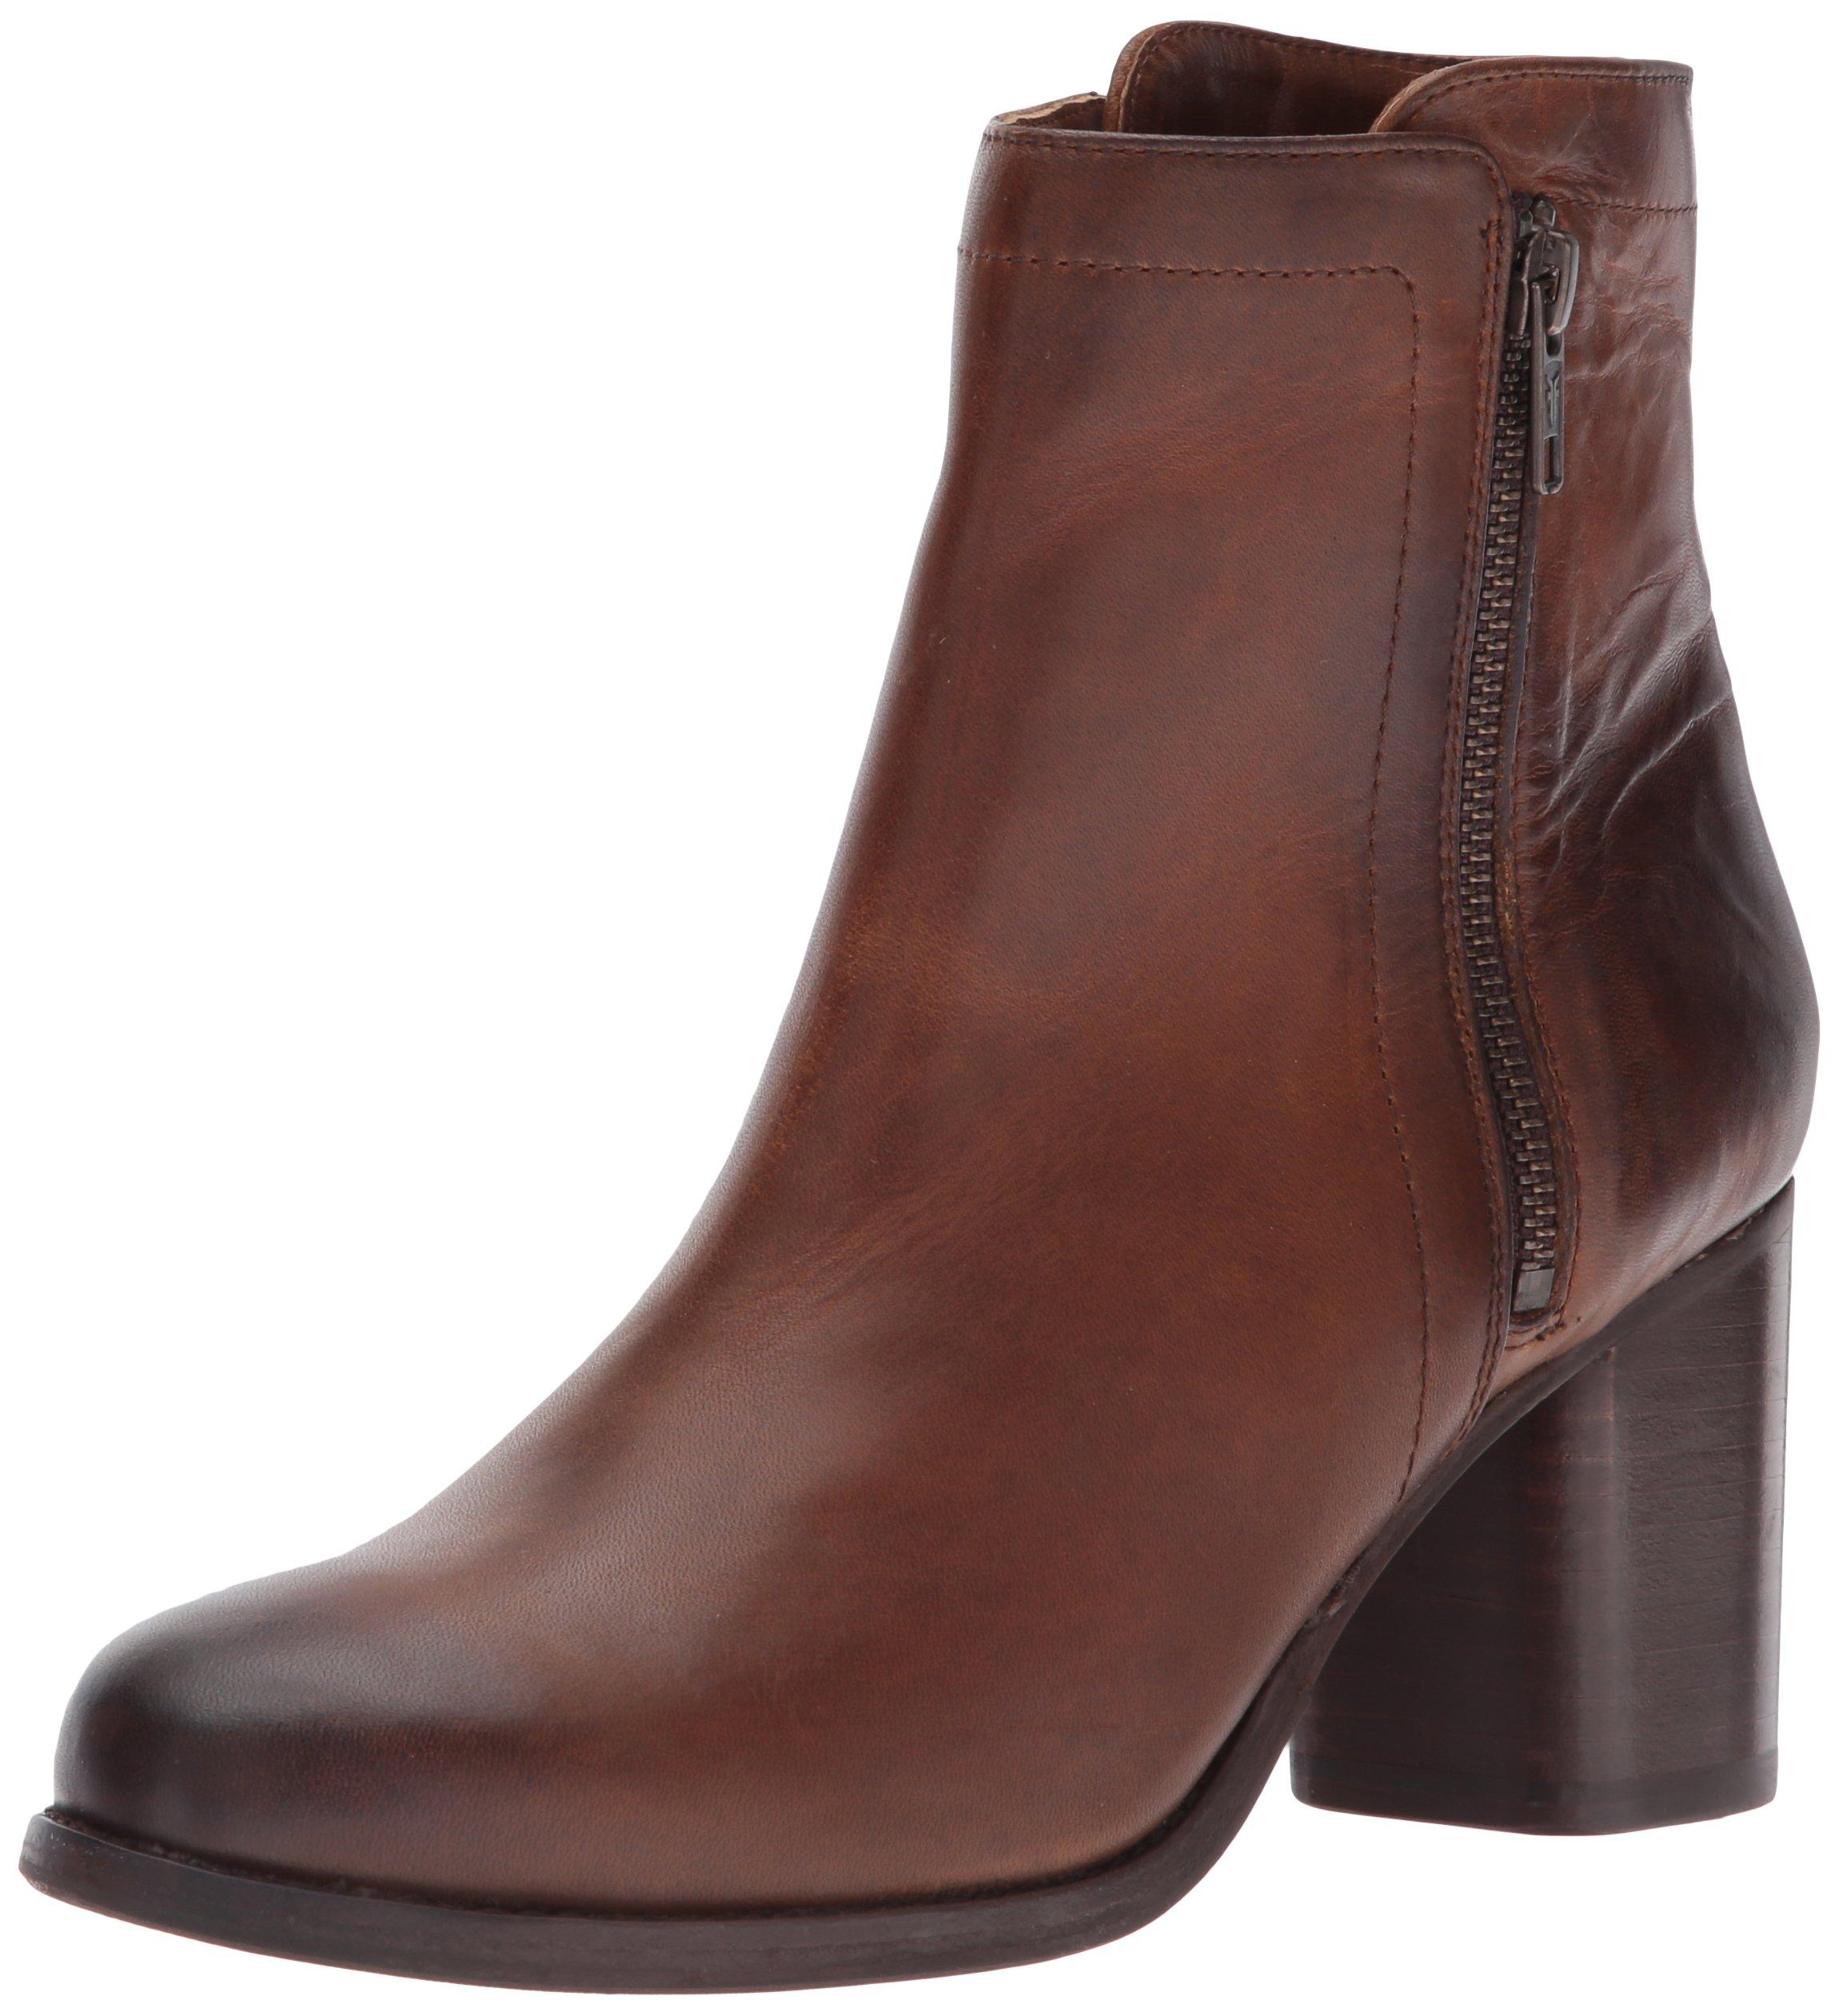 FRYE Women's Addie Double Zip Boot, Whiskey Oil Tanned Full Grain, 8 M US